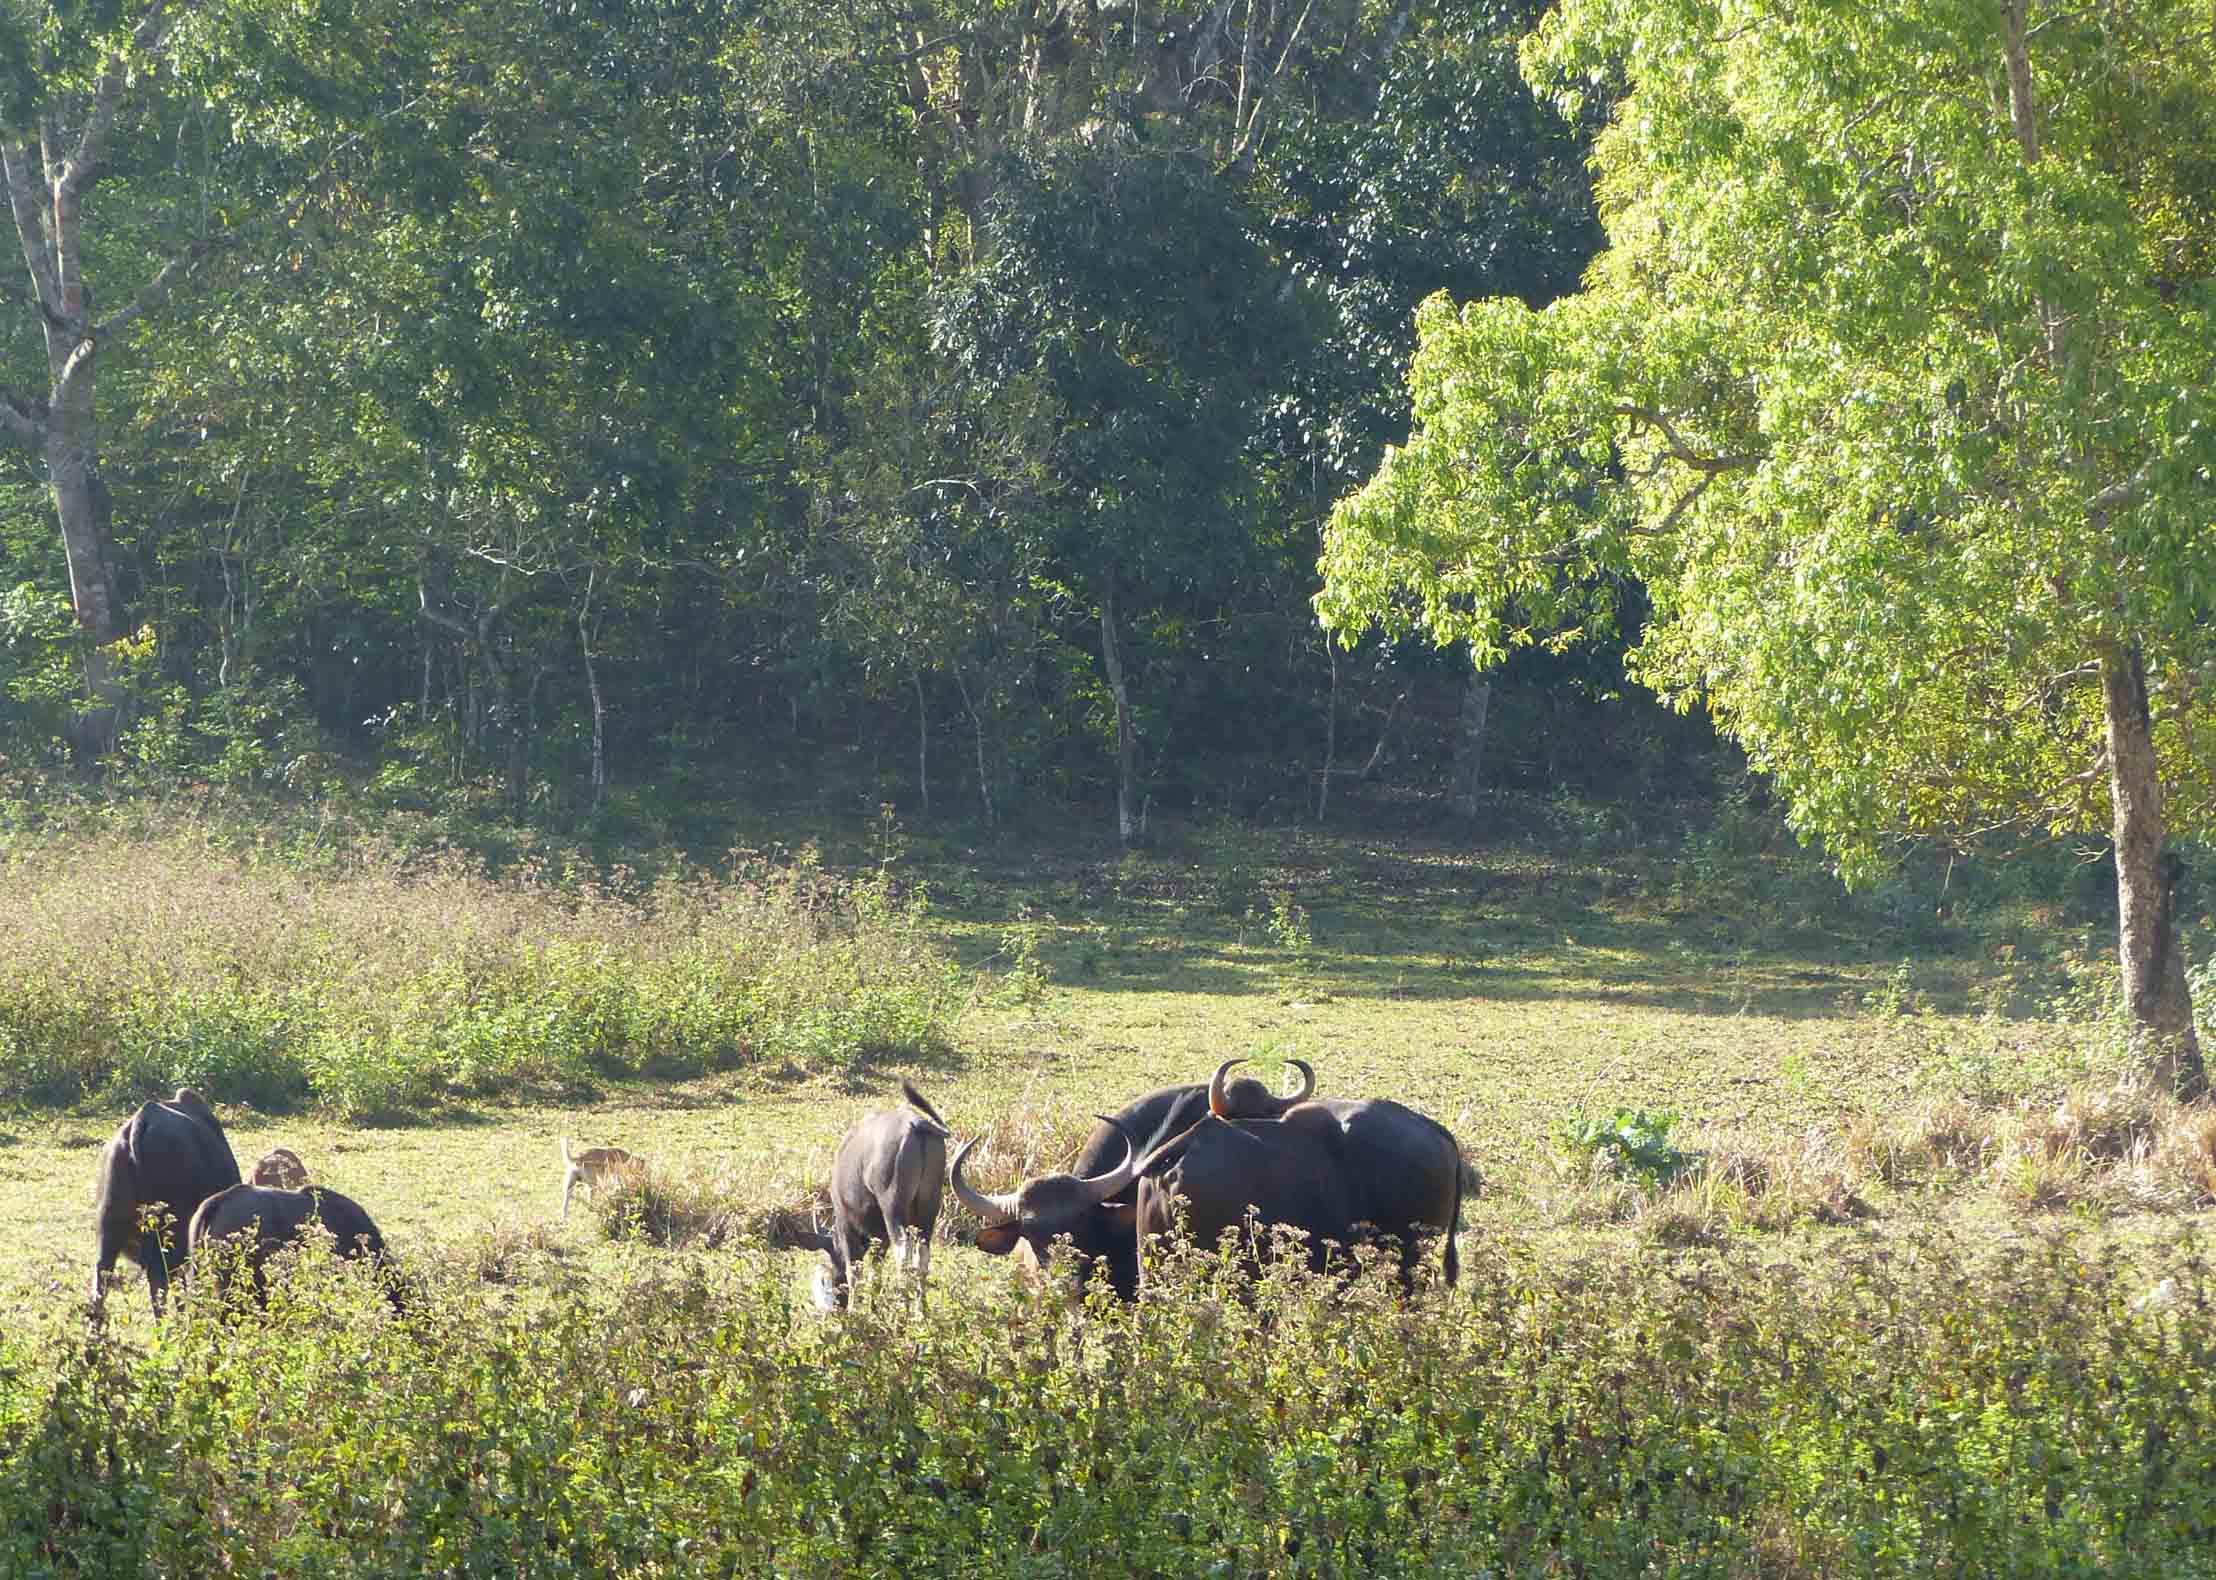 Group of bison among trees